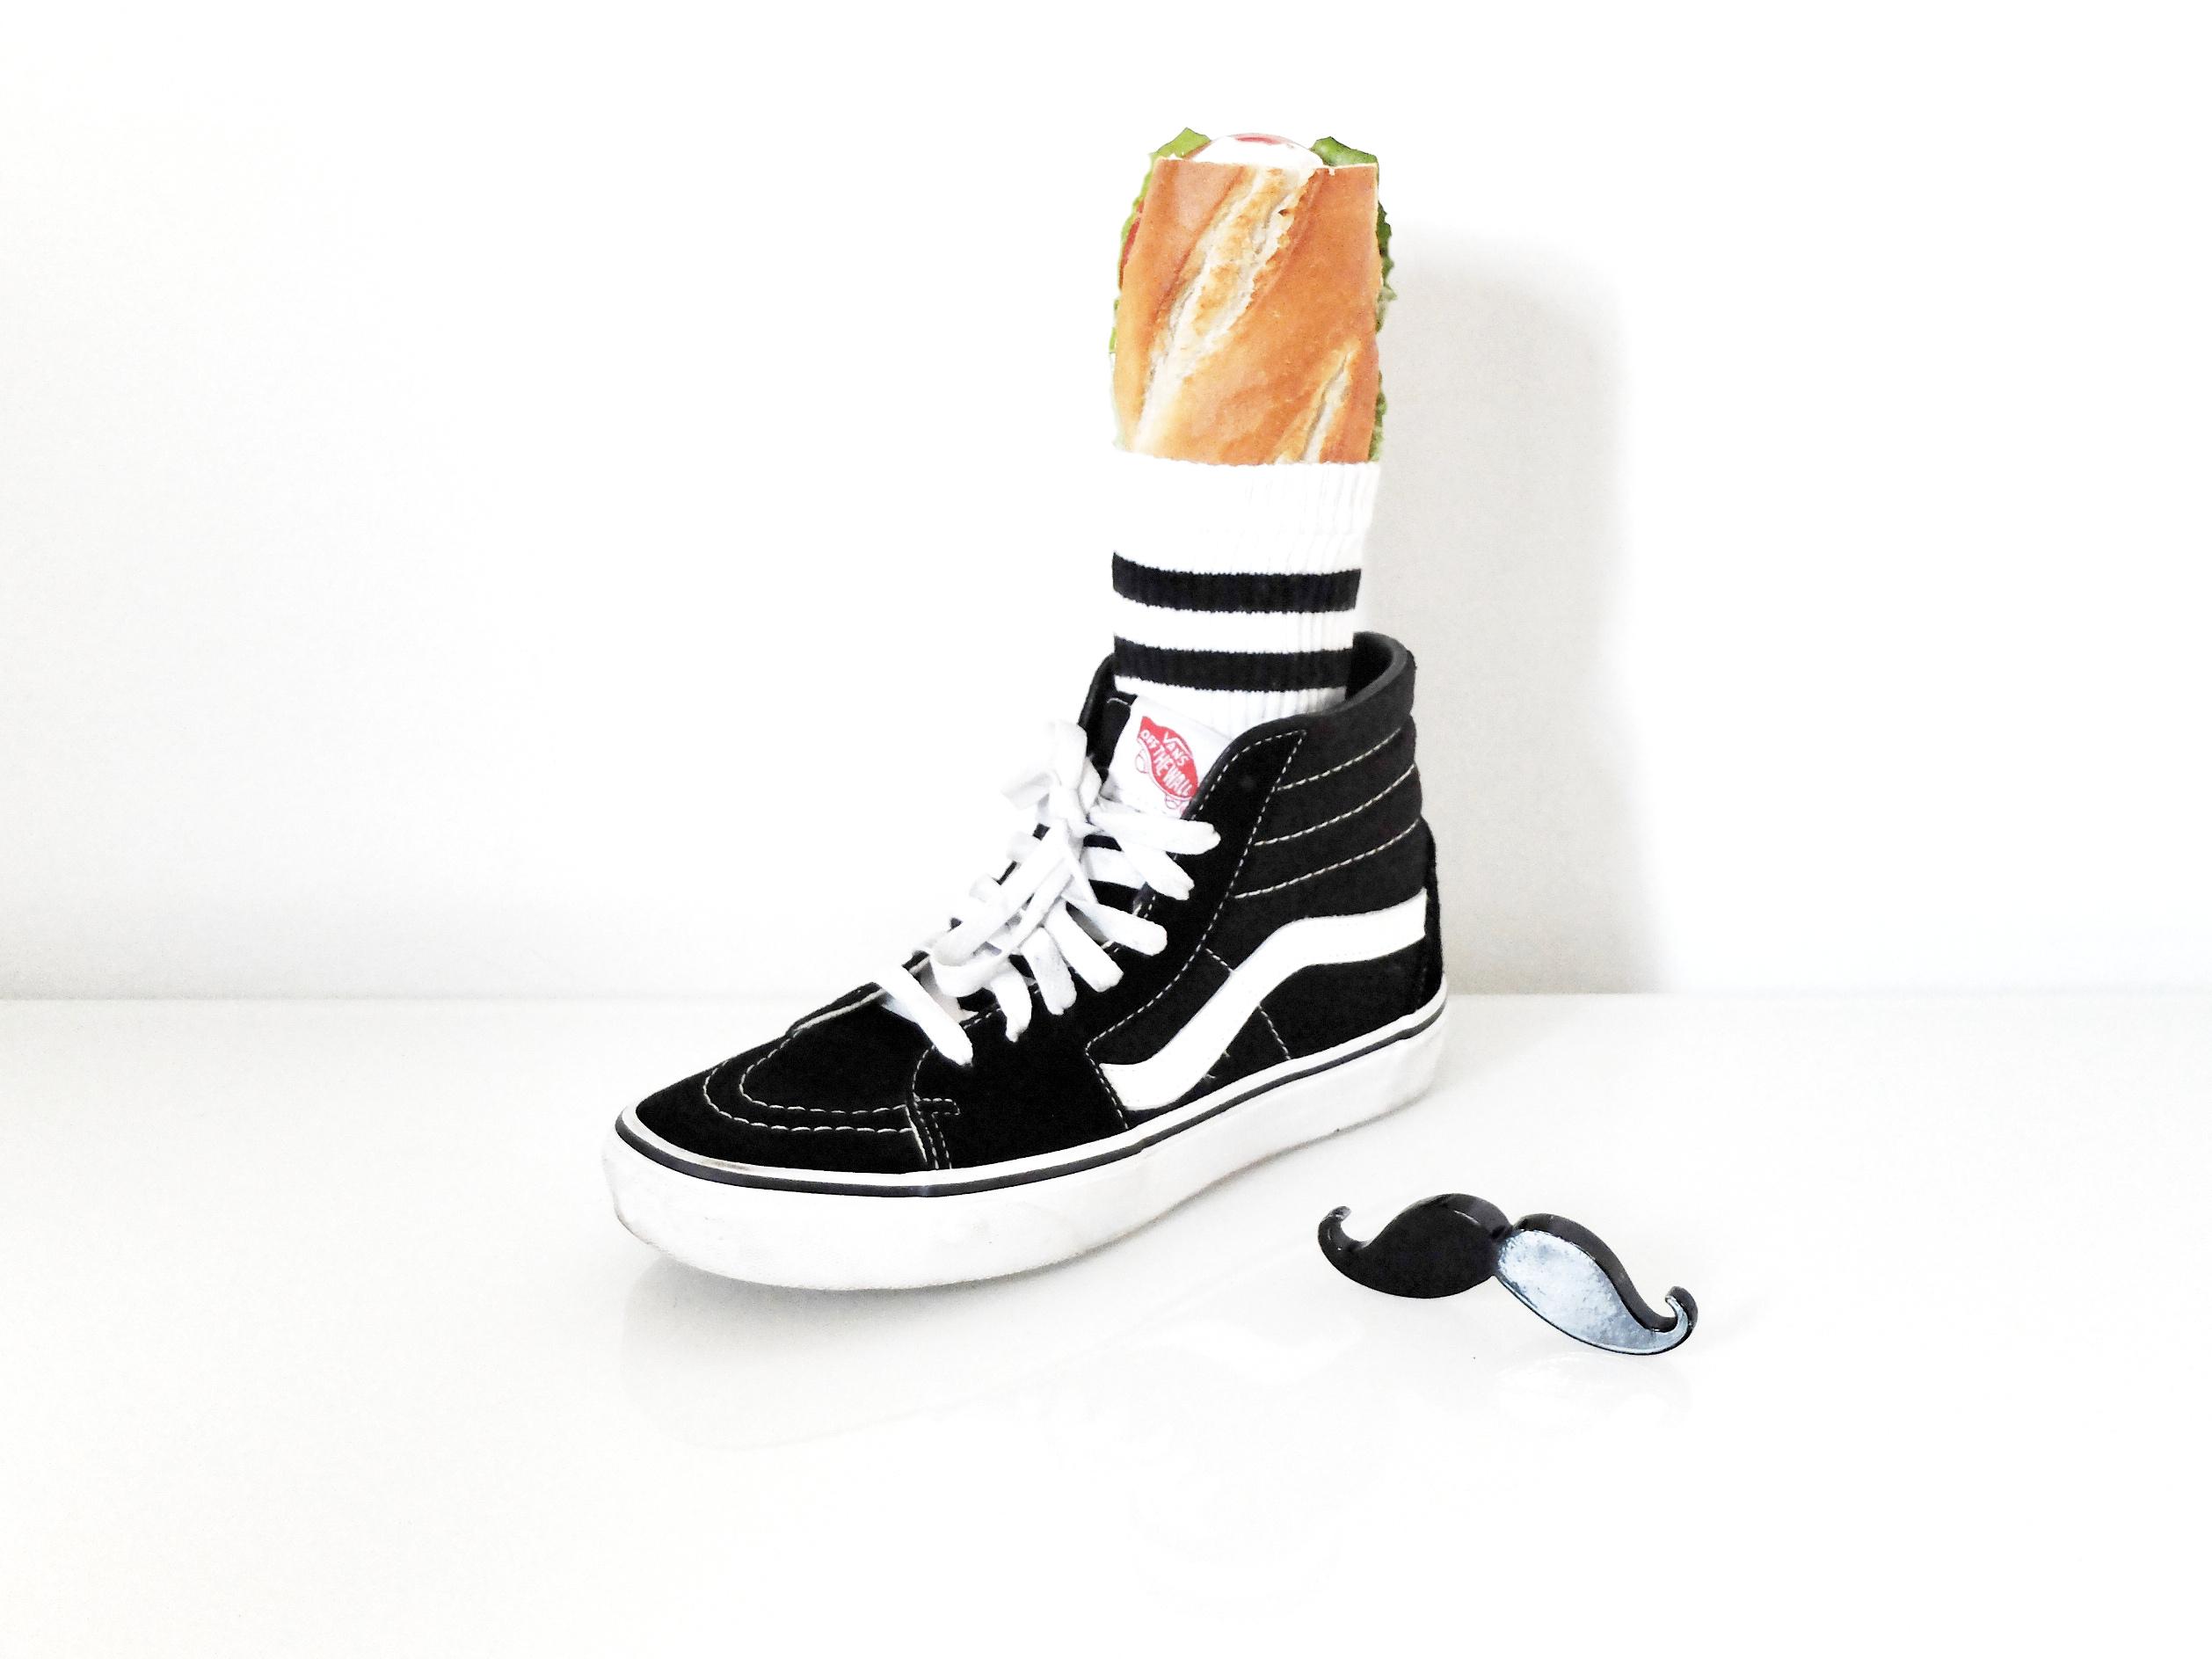 shoe-step-frankreich